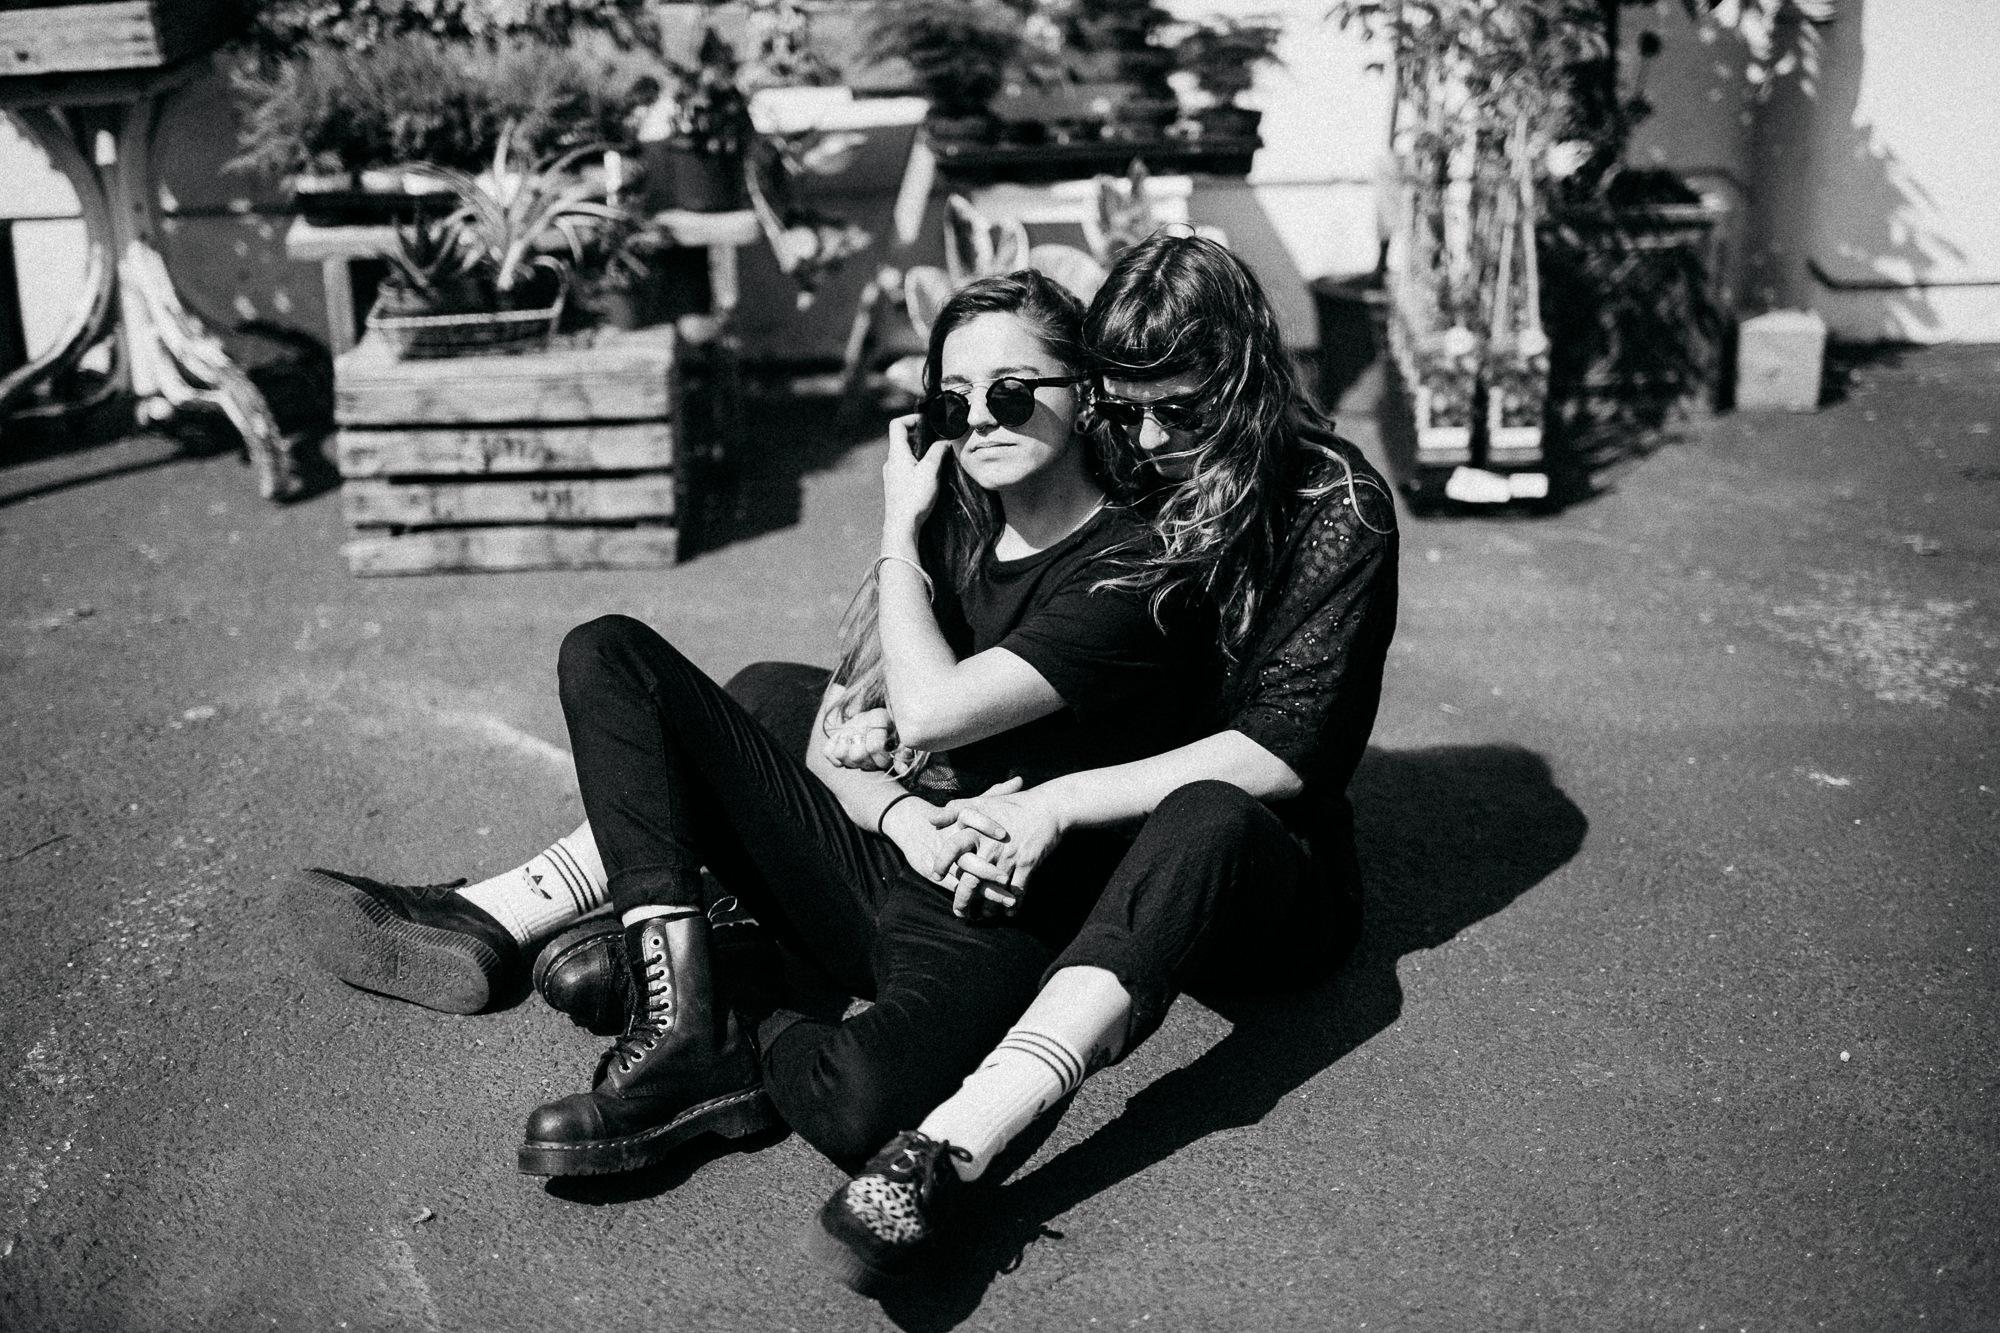 Urbanes Couple-Fotoshooting in Hamburg von Alina Atzler Fotografie